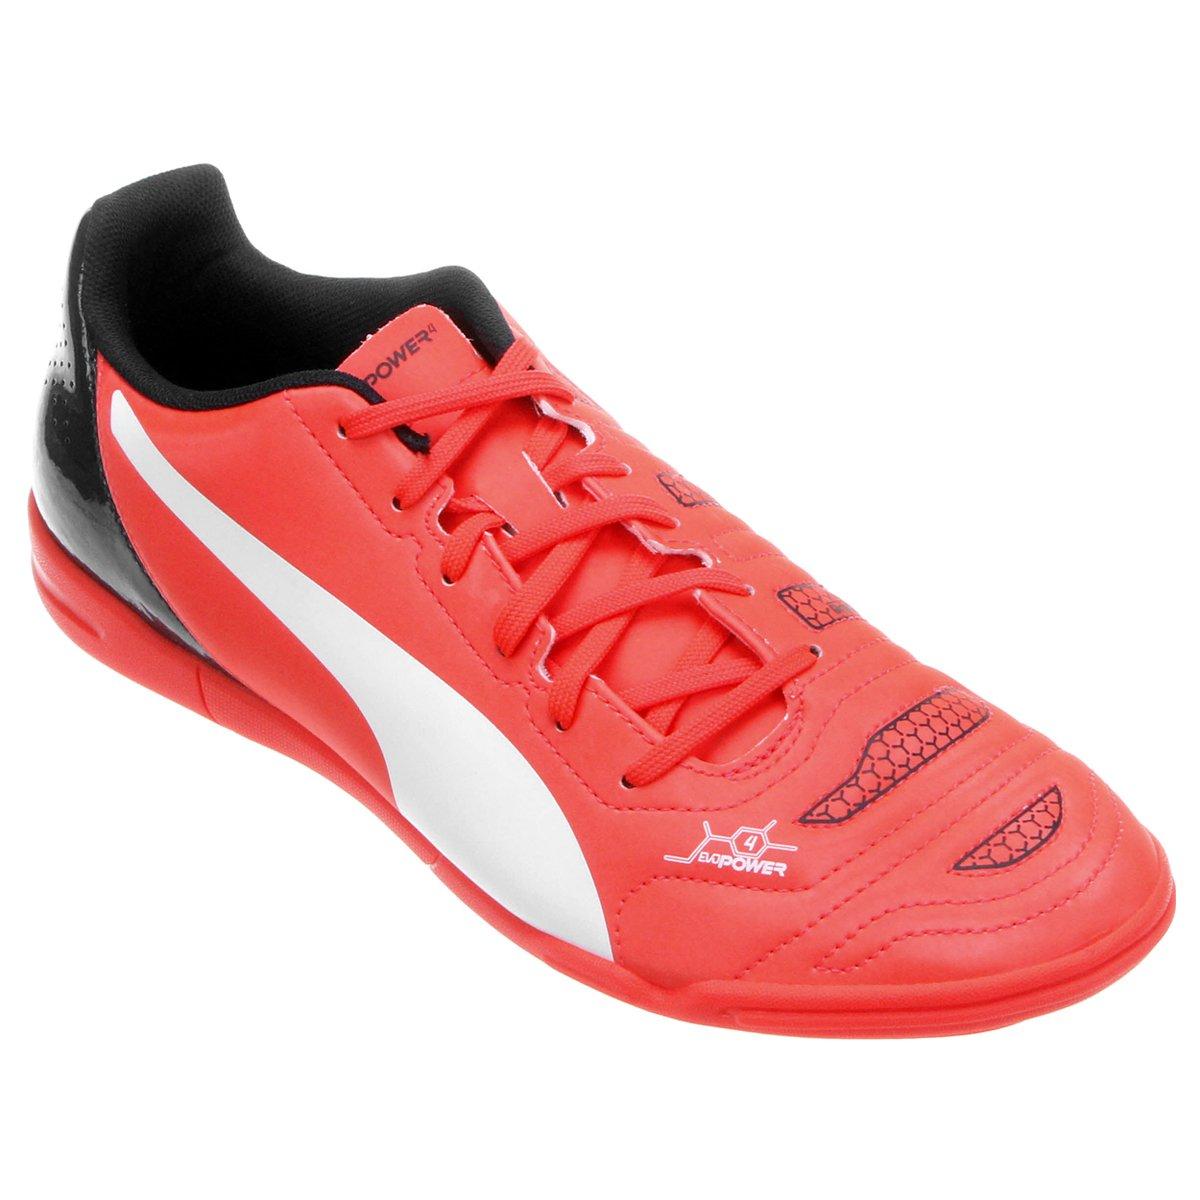 de308b07176 Chuteira Puma Evopower 4.2 IT Futsal - Compre Agora